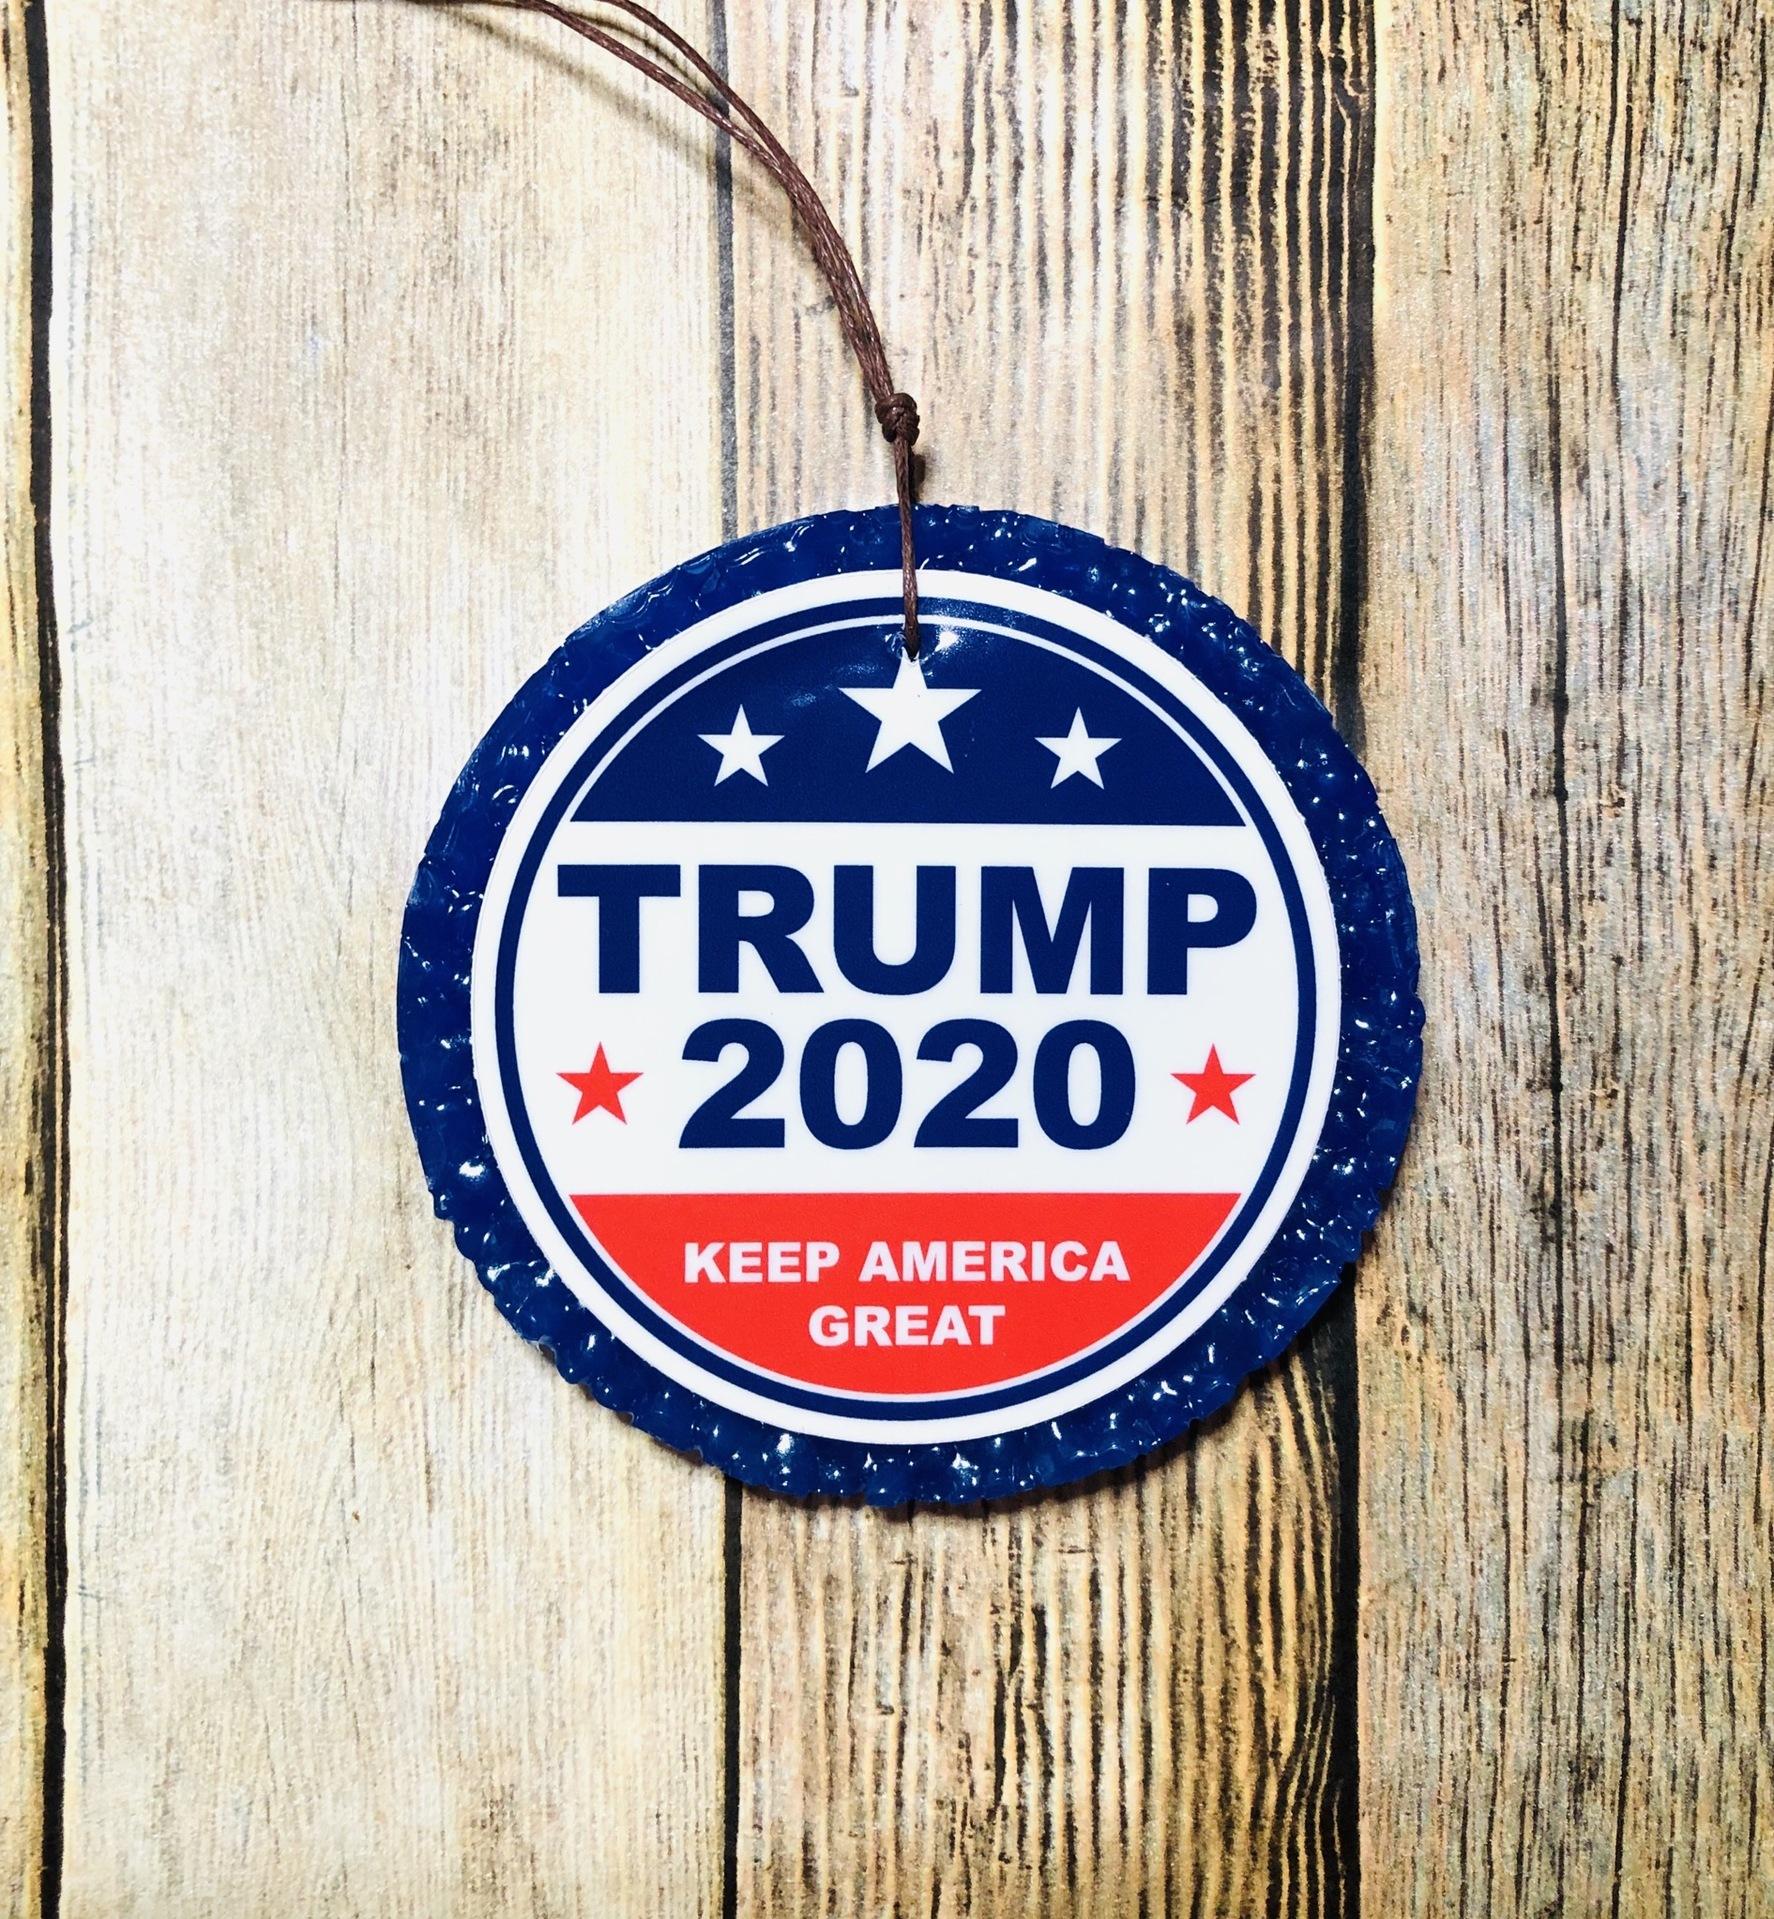 Rachel's photograph of their Trump 2020 Circle Sticker